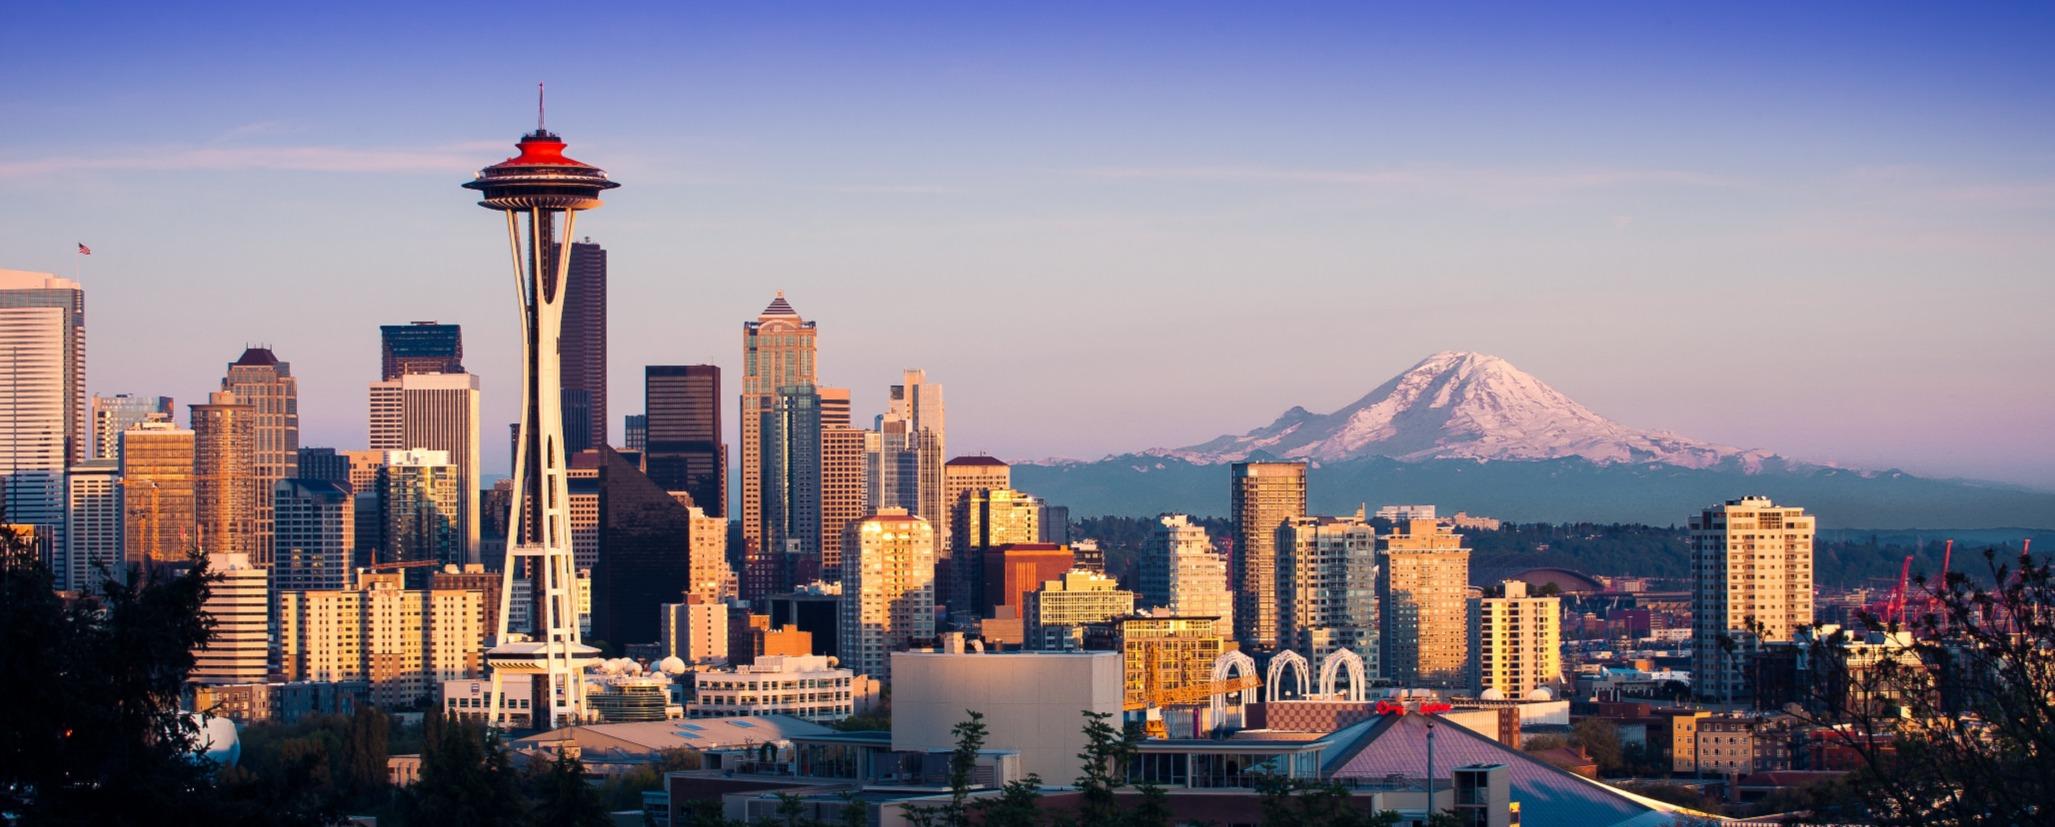 Seattle space needle city skyline